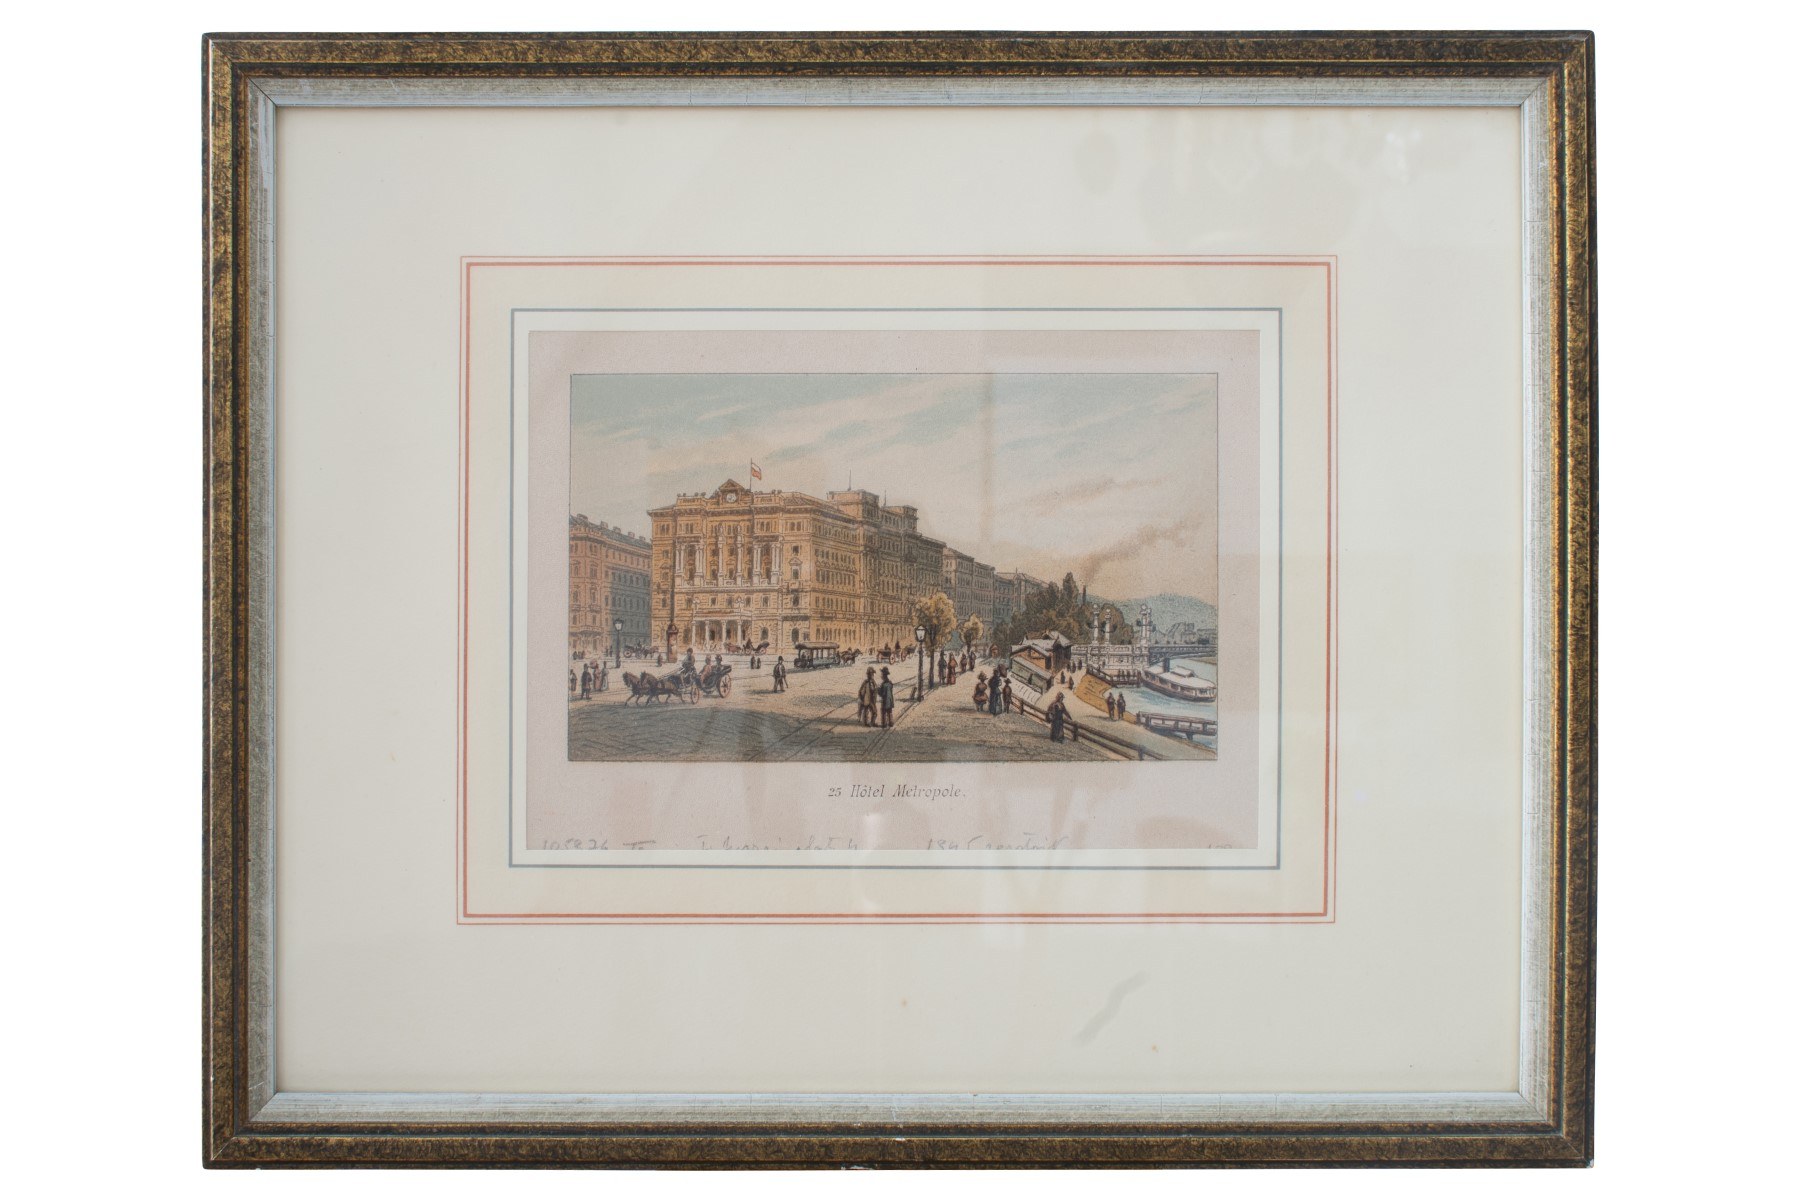 #36 Johann Varrone (1832-1910) und Eugen Ladislaus Petrovits (1839-1907), Hotel Metropole | Johann Varrone (1832-1910) und Eugen Ladislaus Petrovits (1839-1907), Hotel Metropole Image